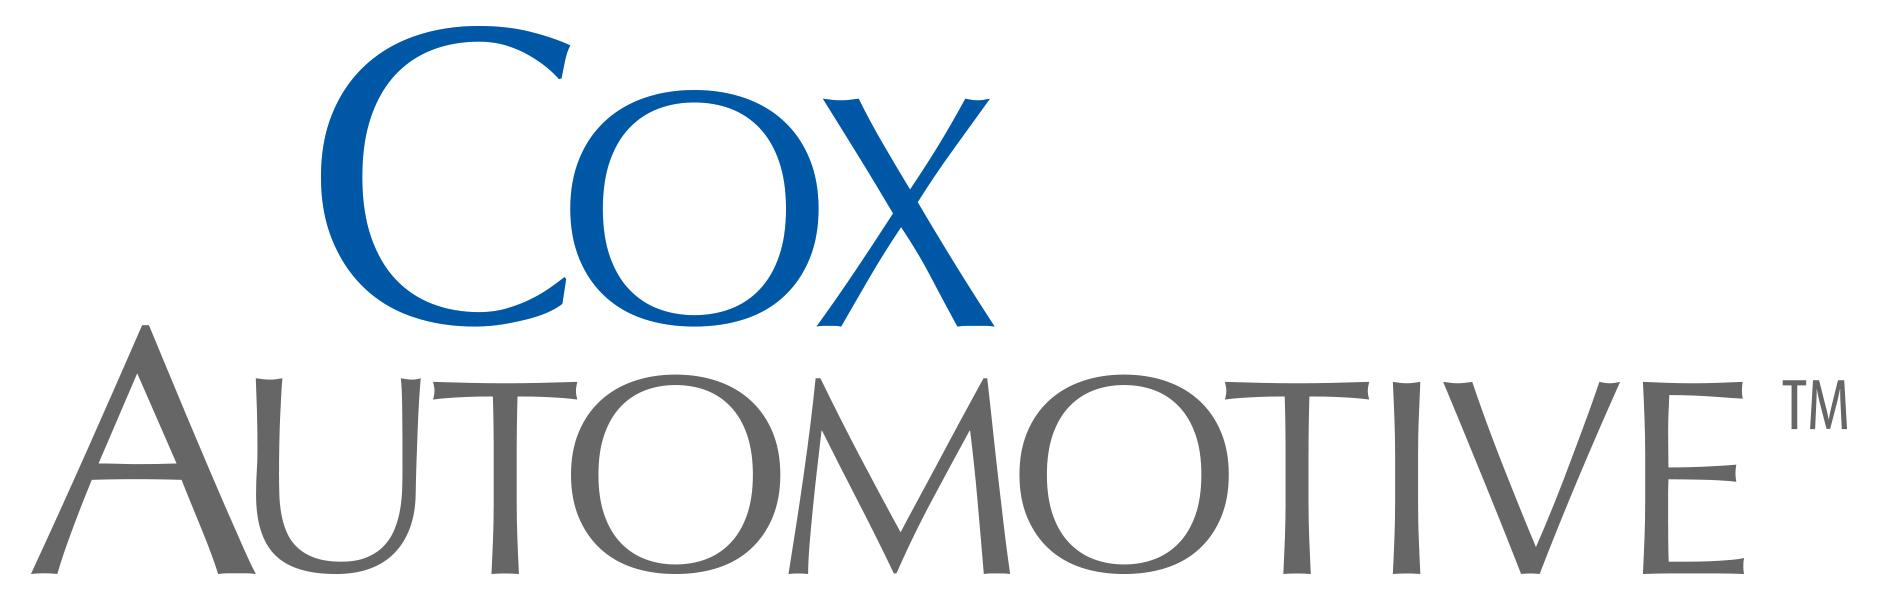 Cox_Automotive_color.jpg